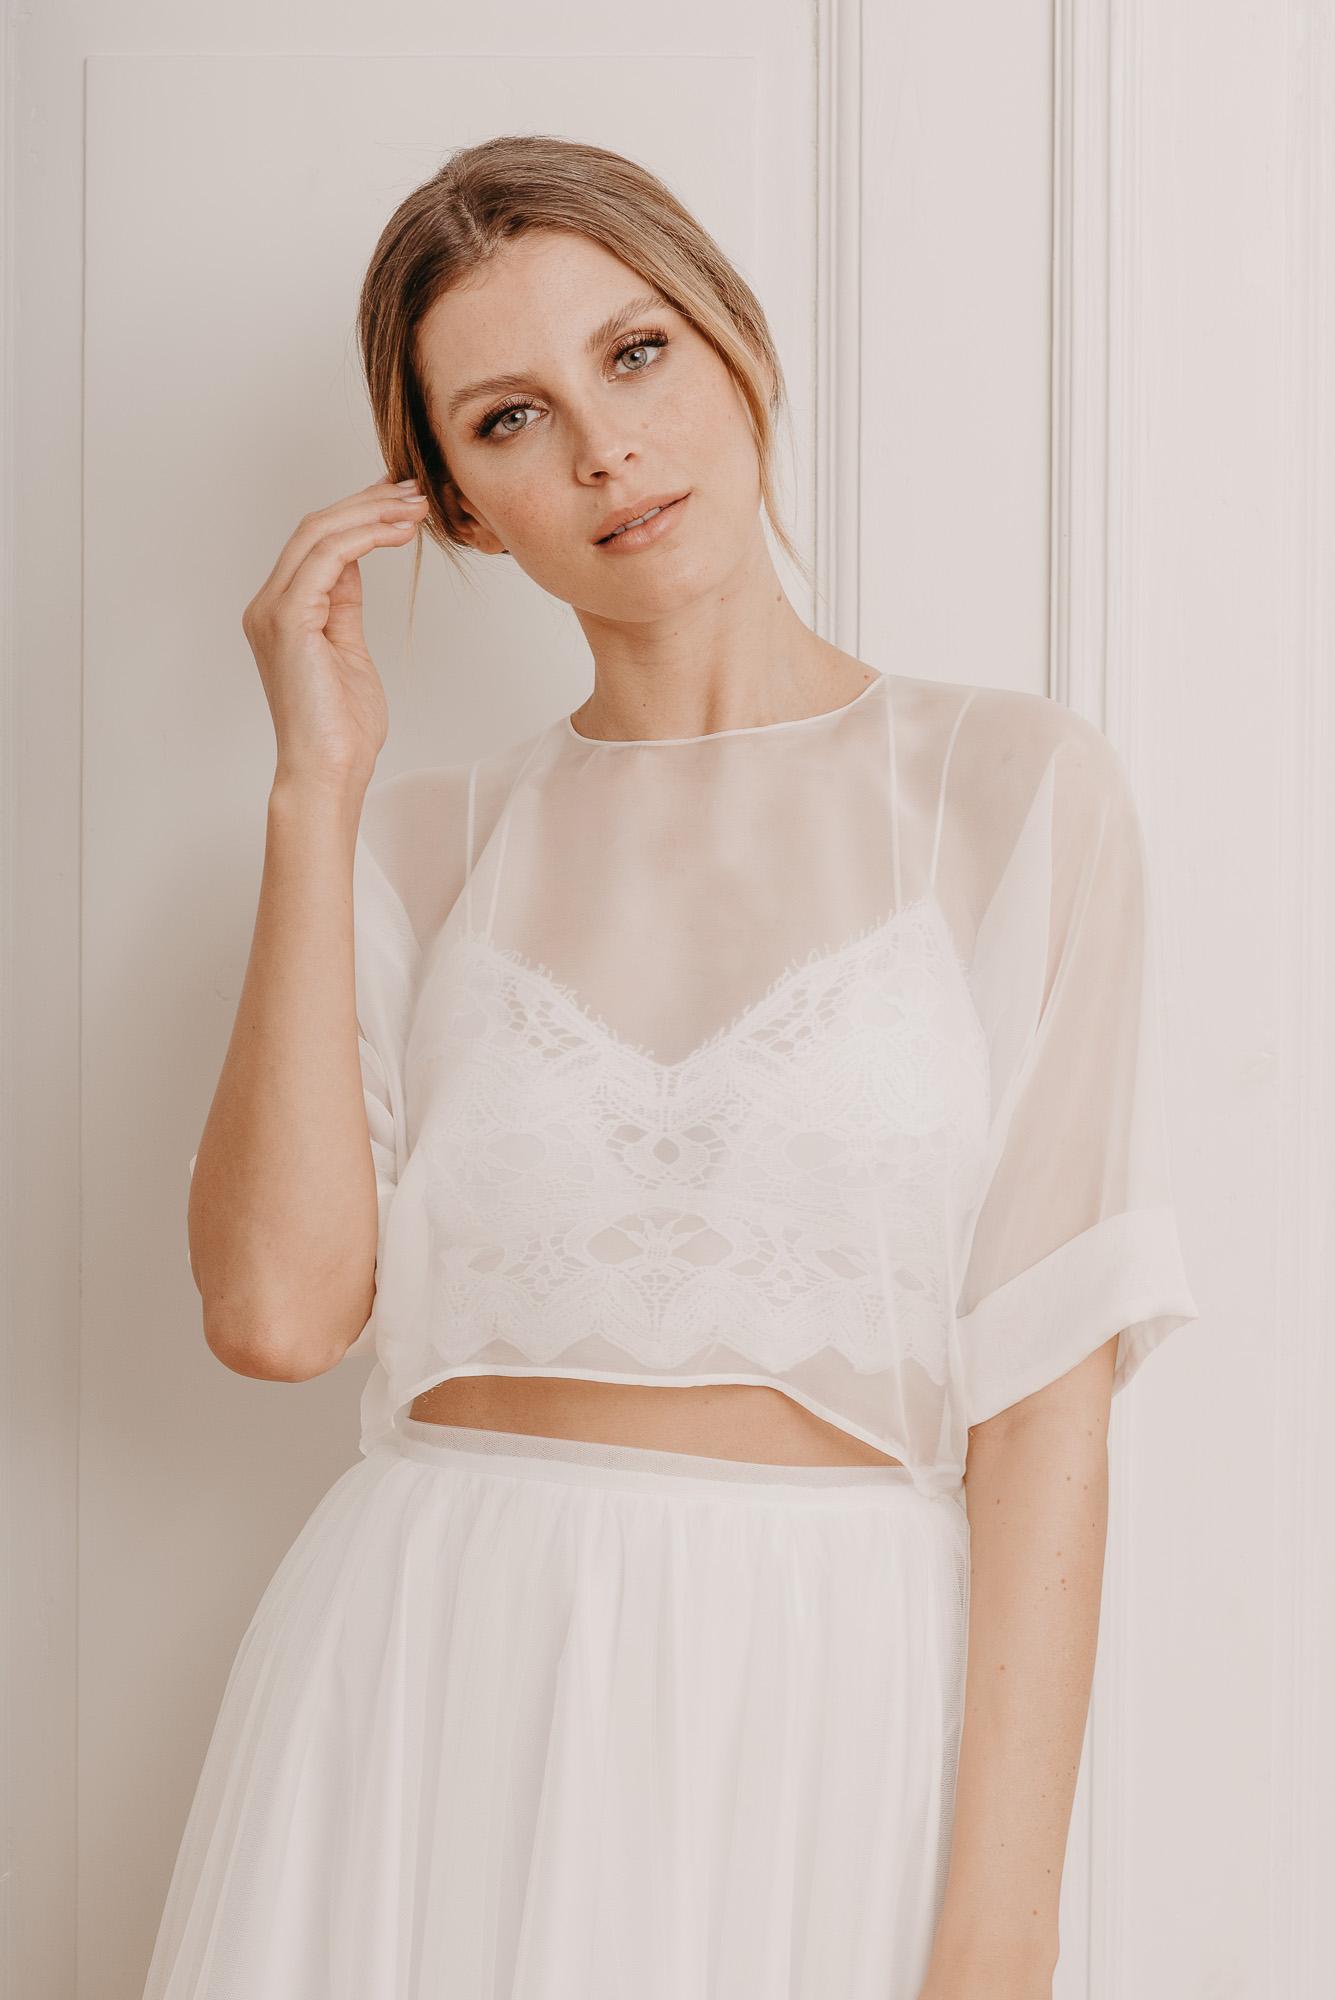 Soft Ash Seidenshirt - Mix & Match Brautmode von Oonce